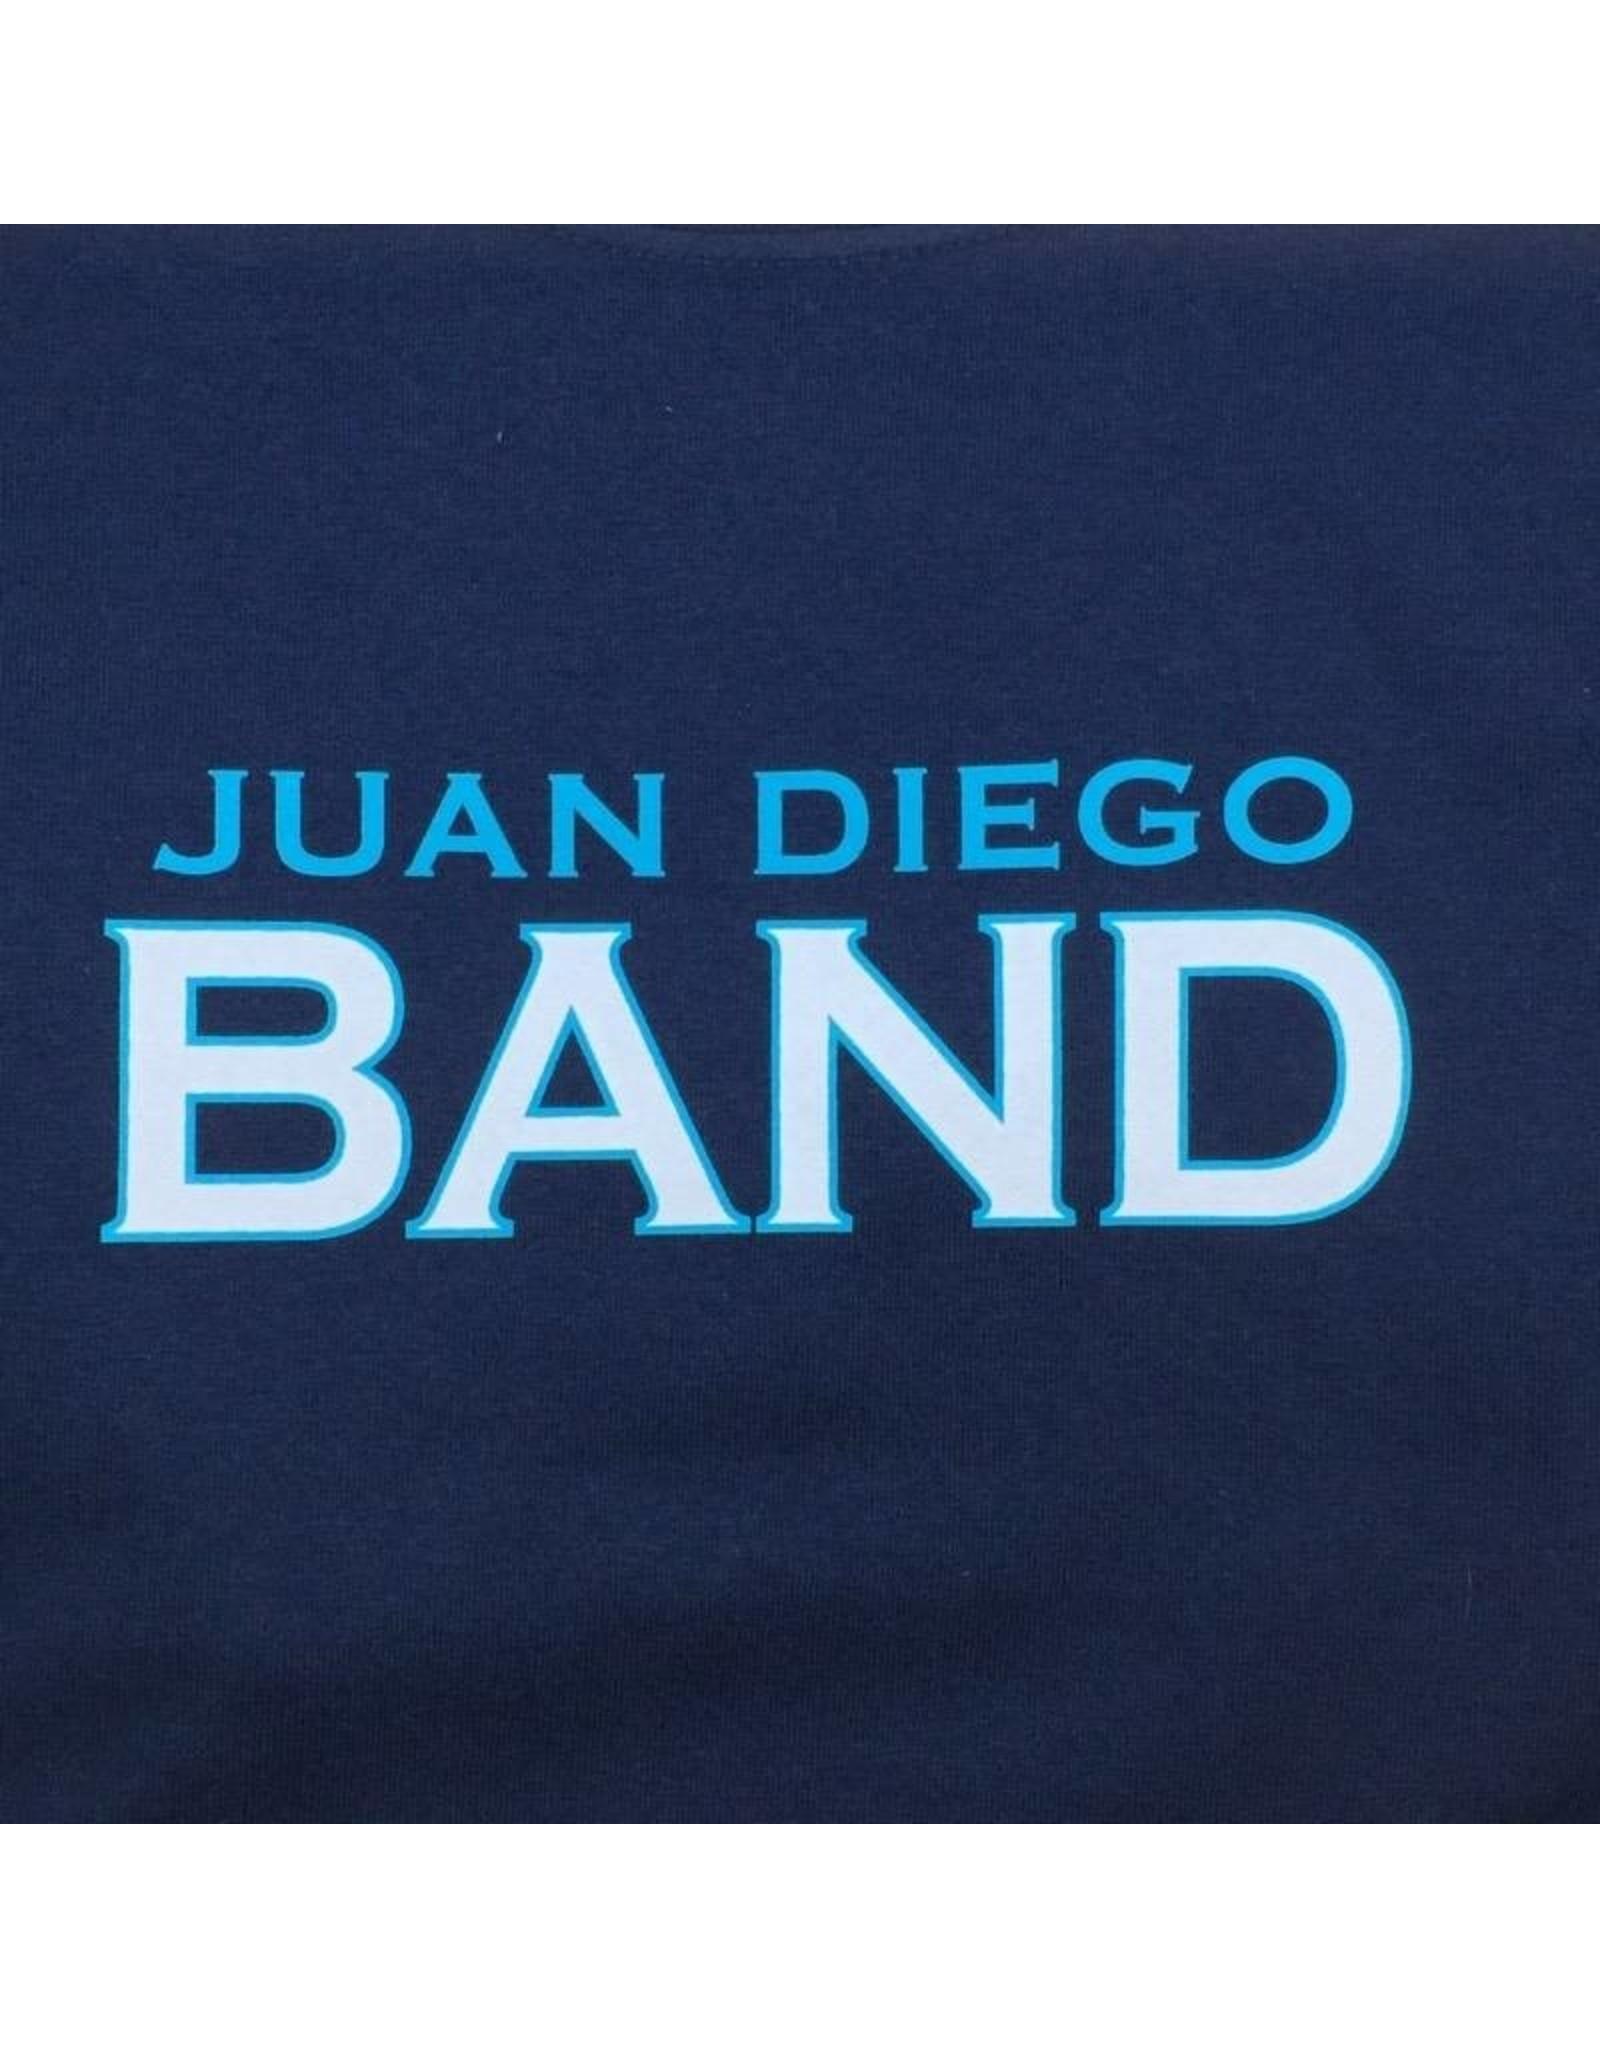 NON-UNIFORM Band, Juan Diego Band Custom Order Navy Unisex s/s t-shirt